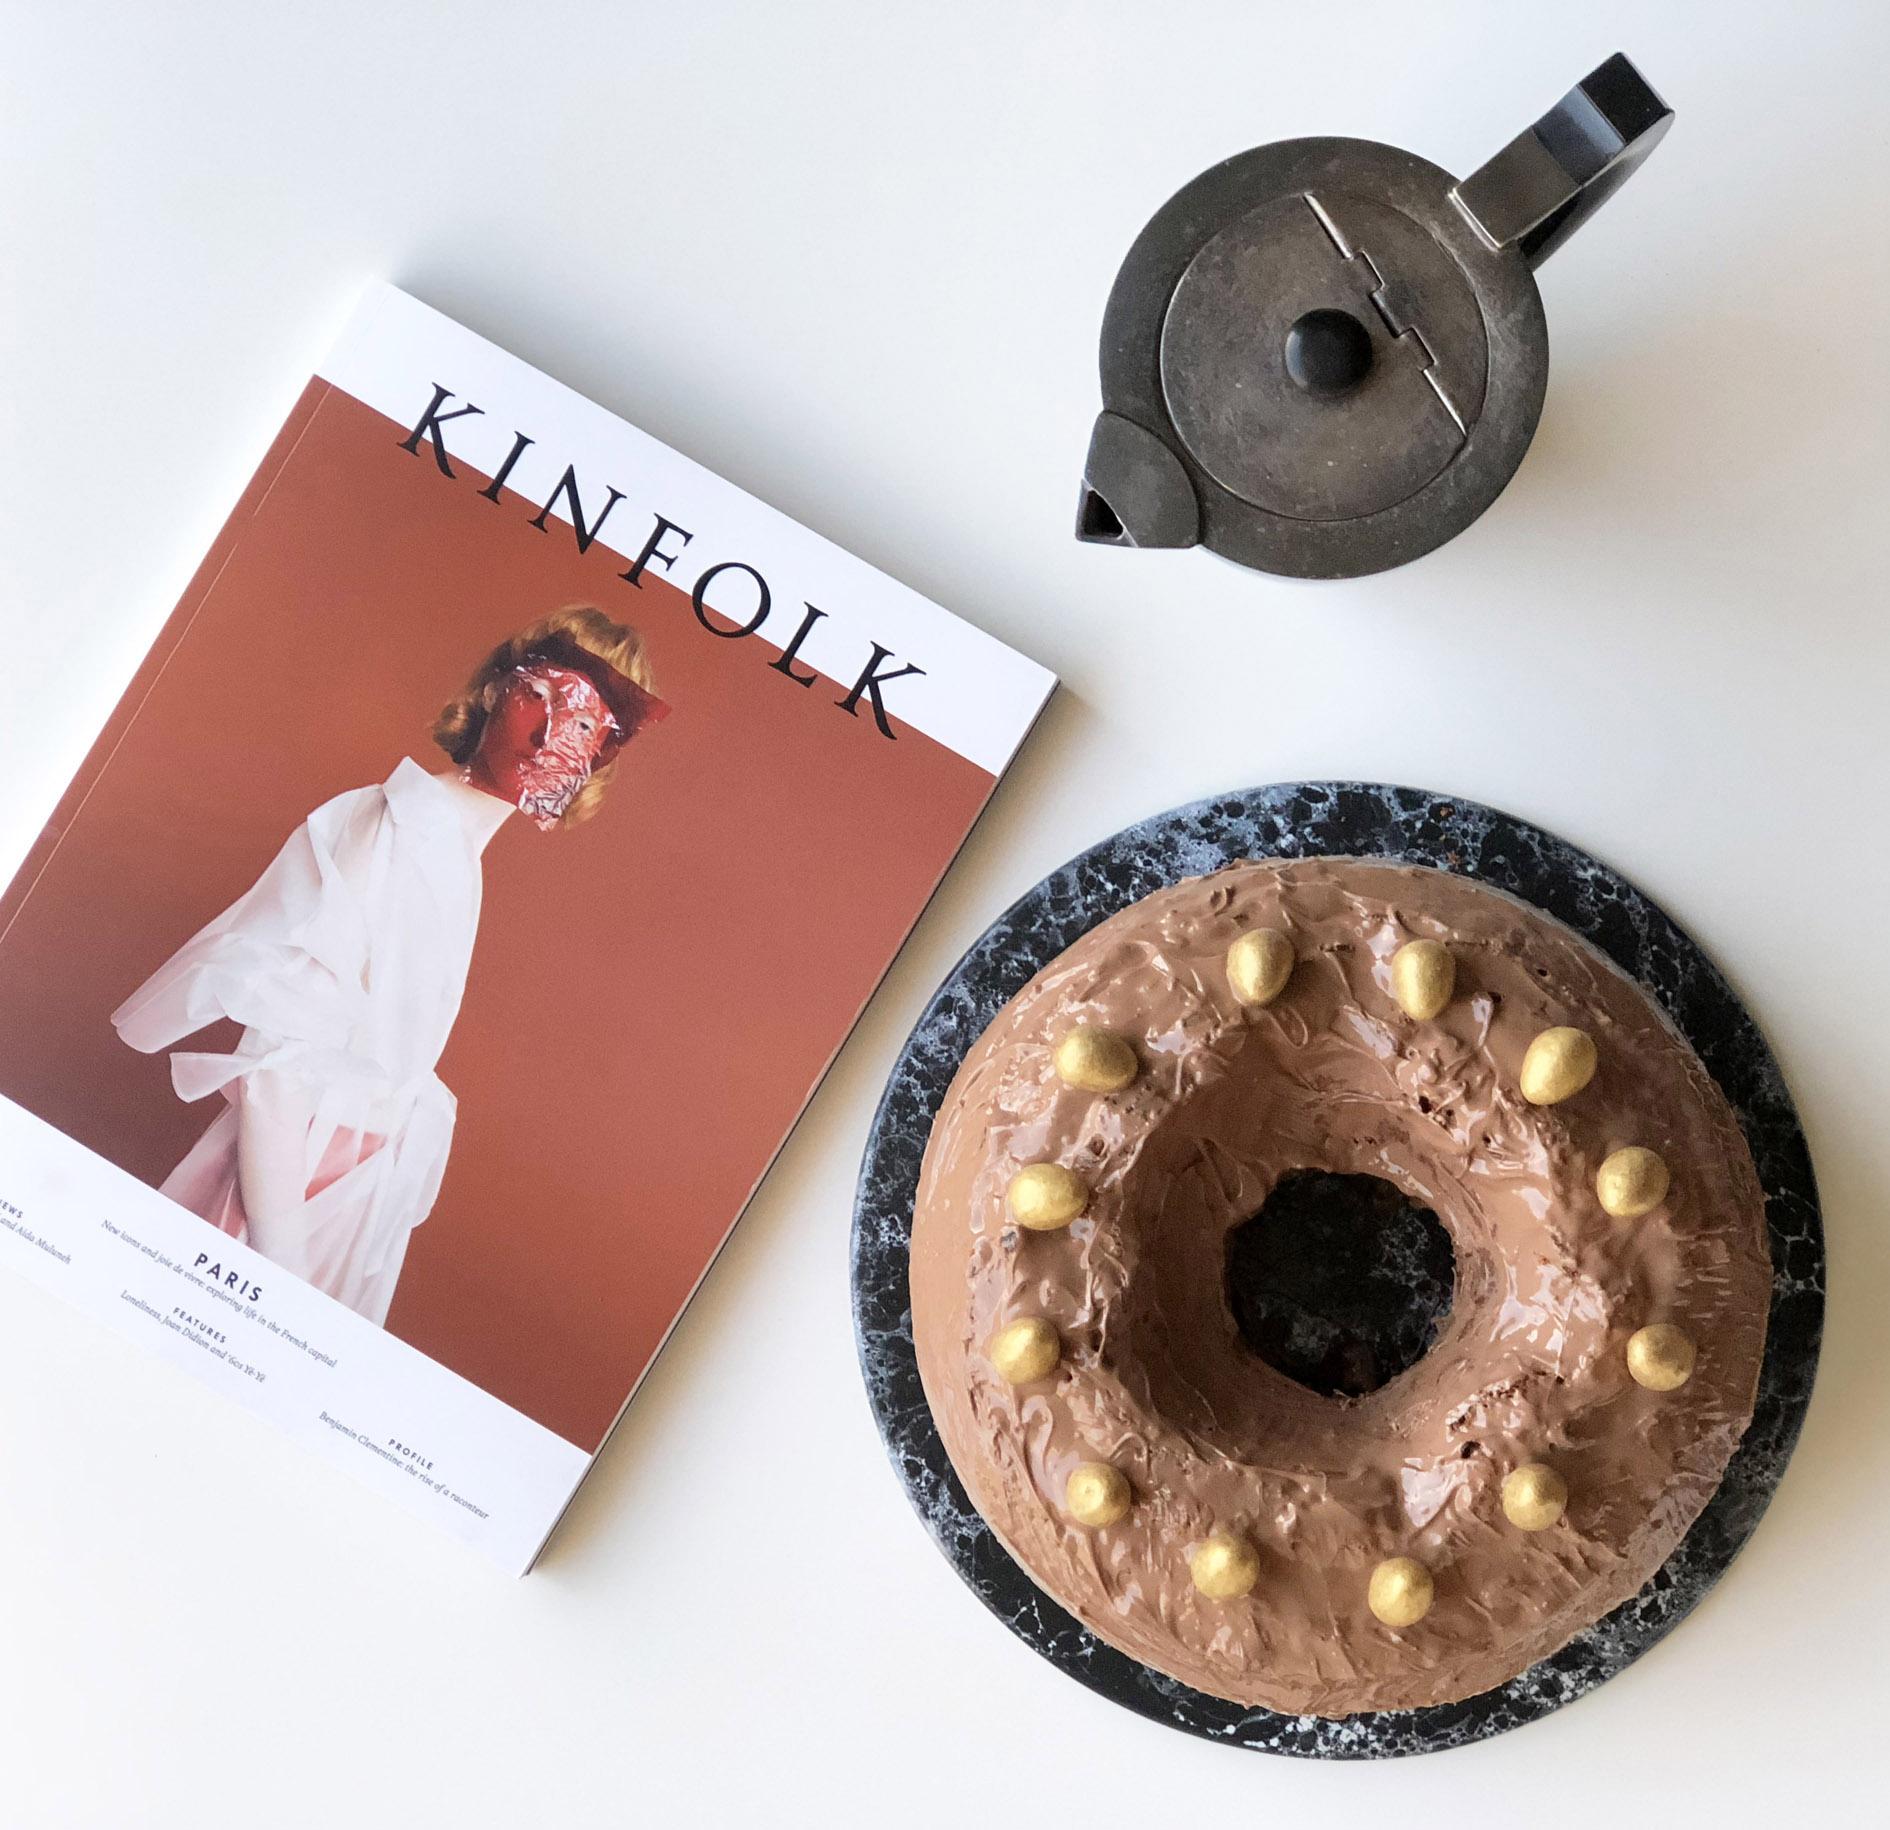 marble cake, wilgotna babka, ciasta na wielkanoc by fashhion art media